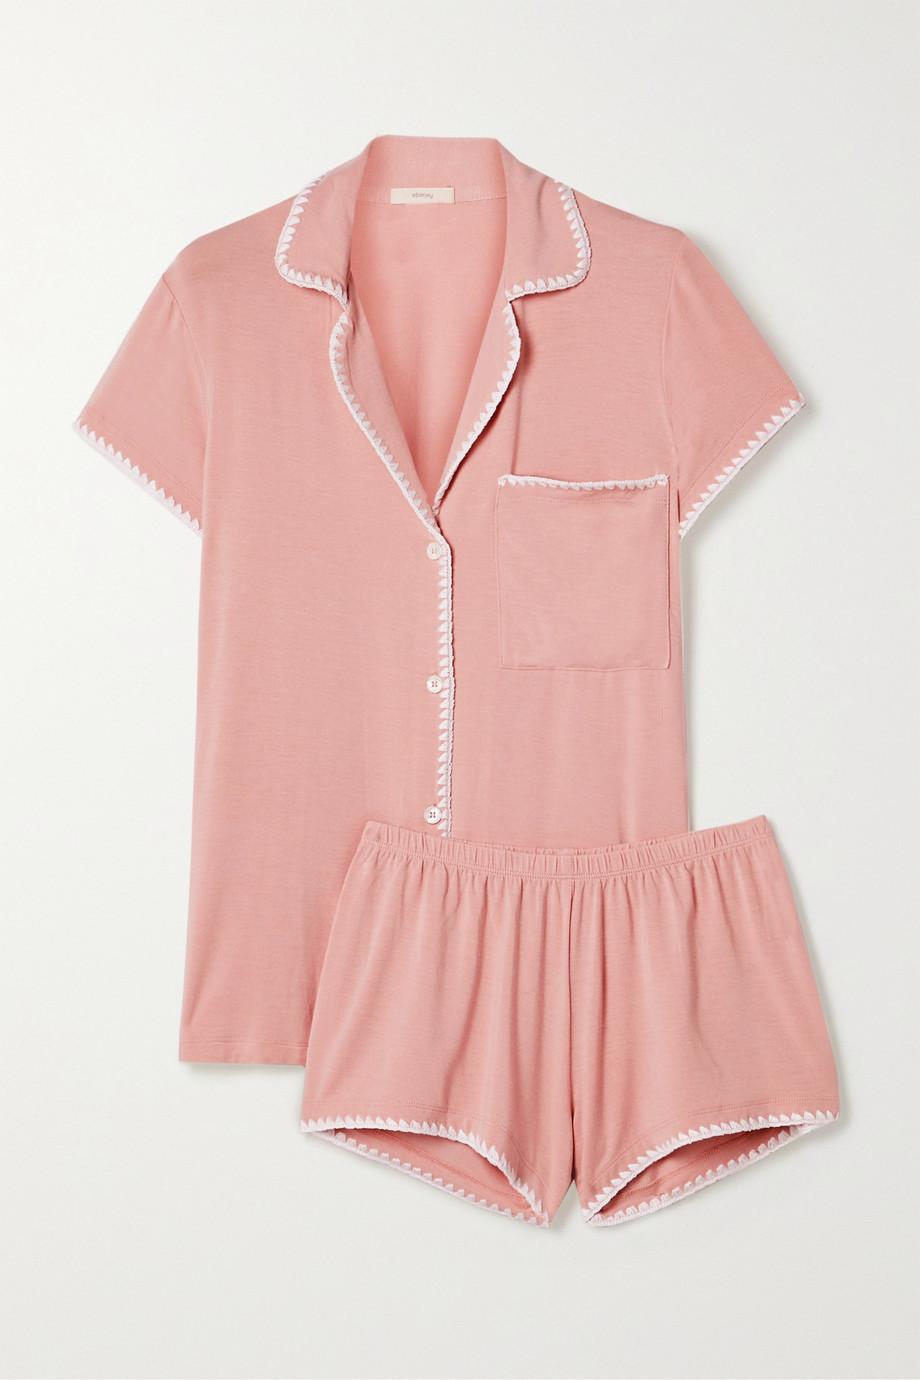 Pijama de manga corta y short (140 ¤) Eberjey.